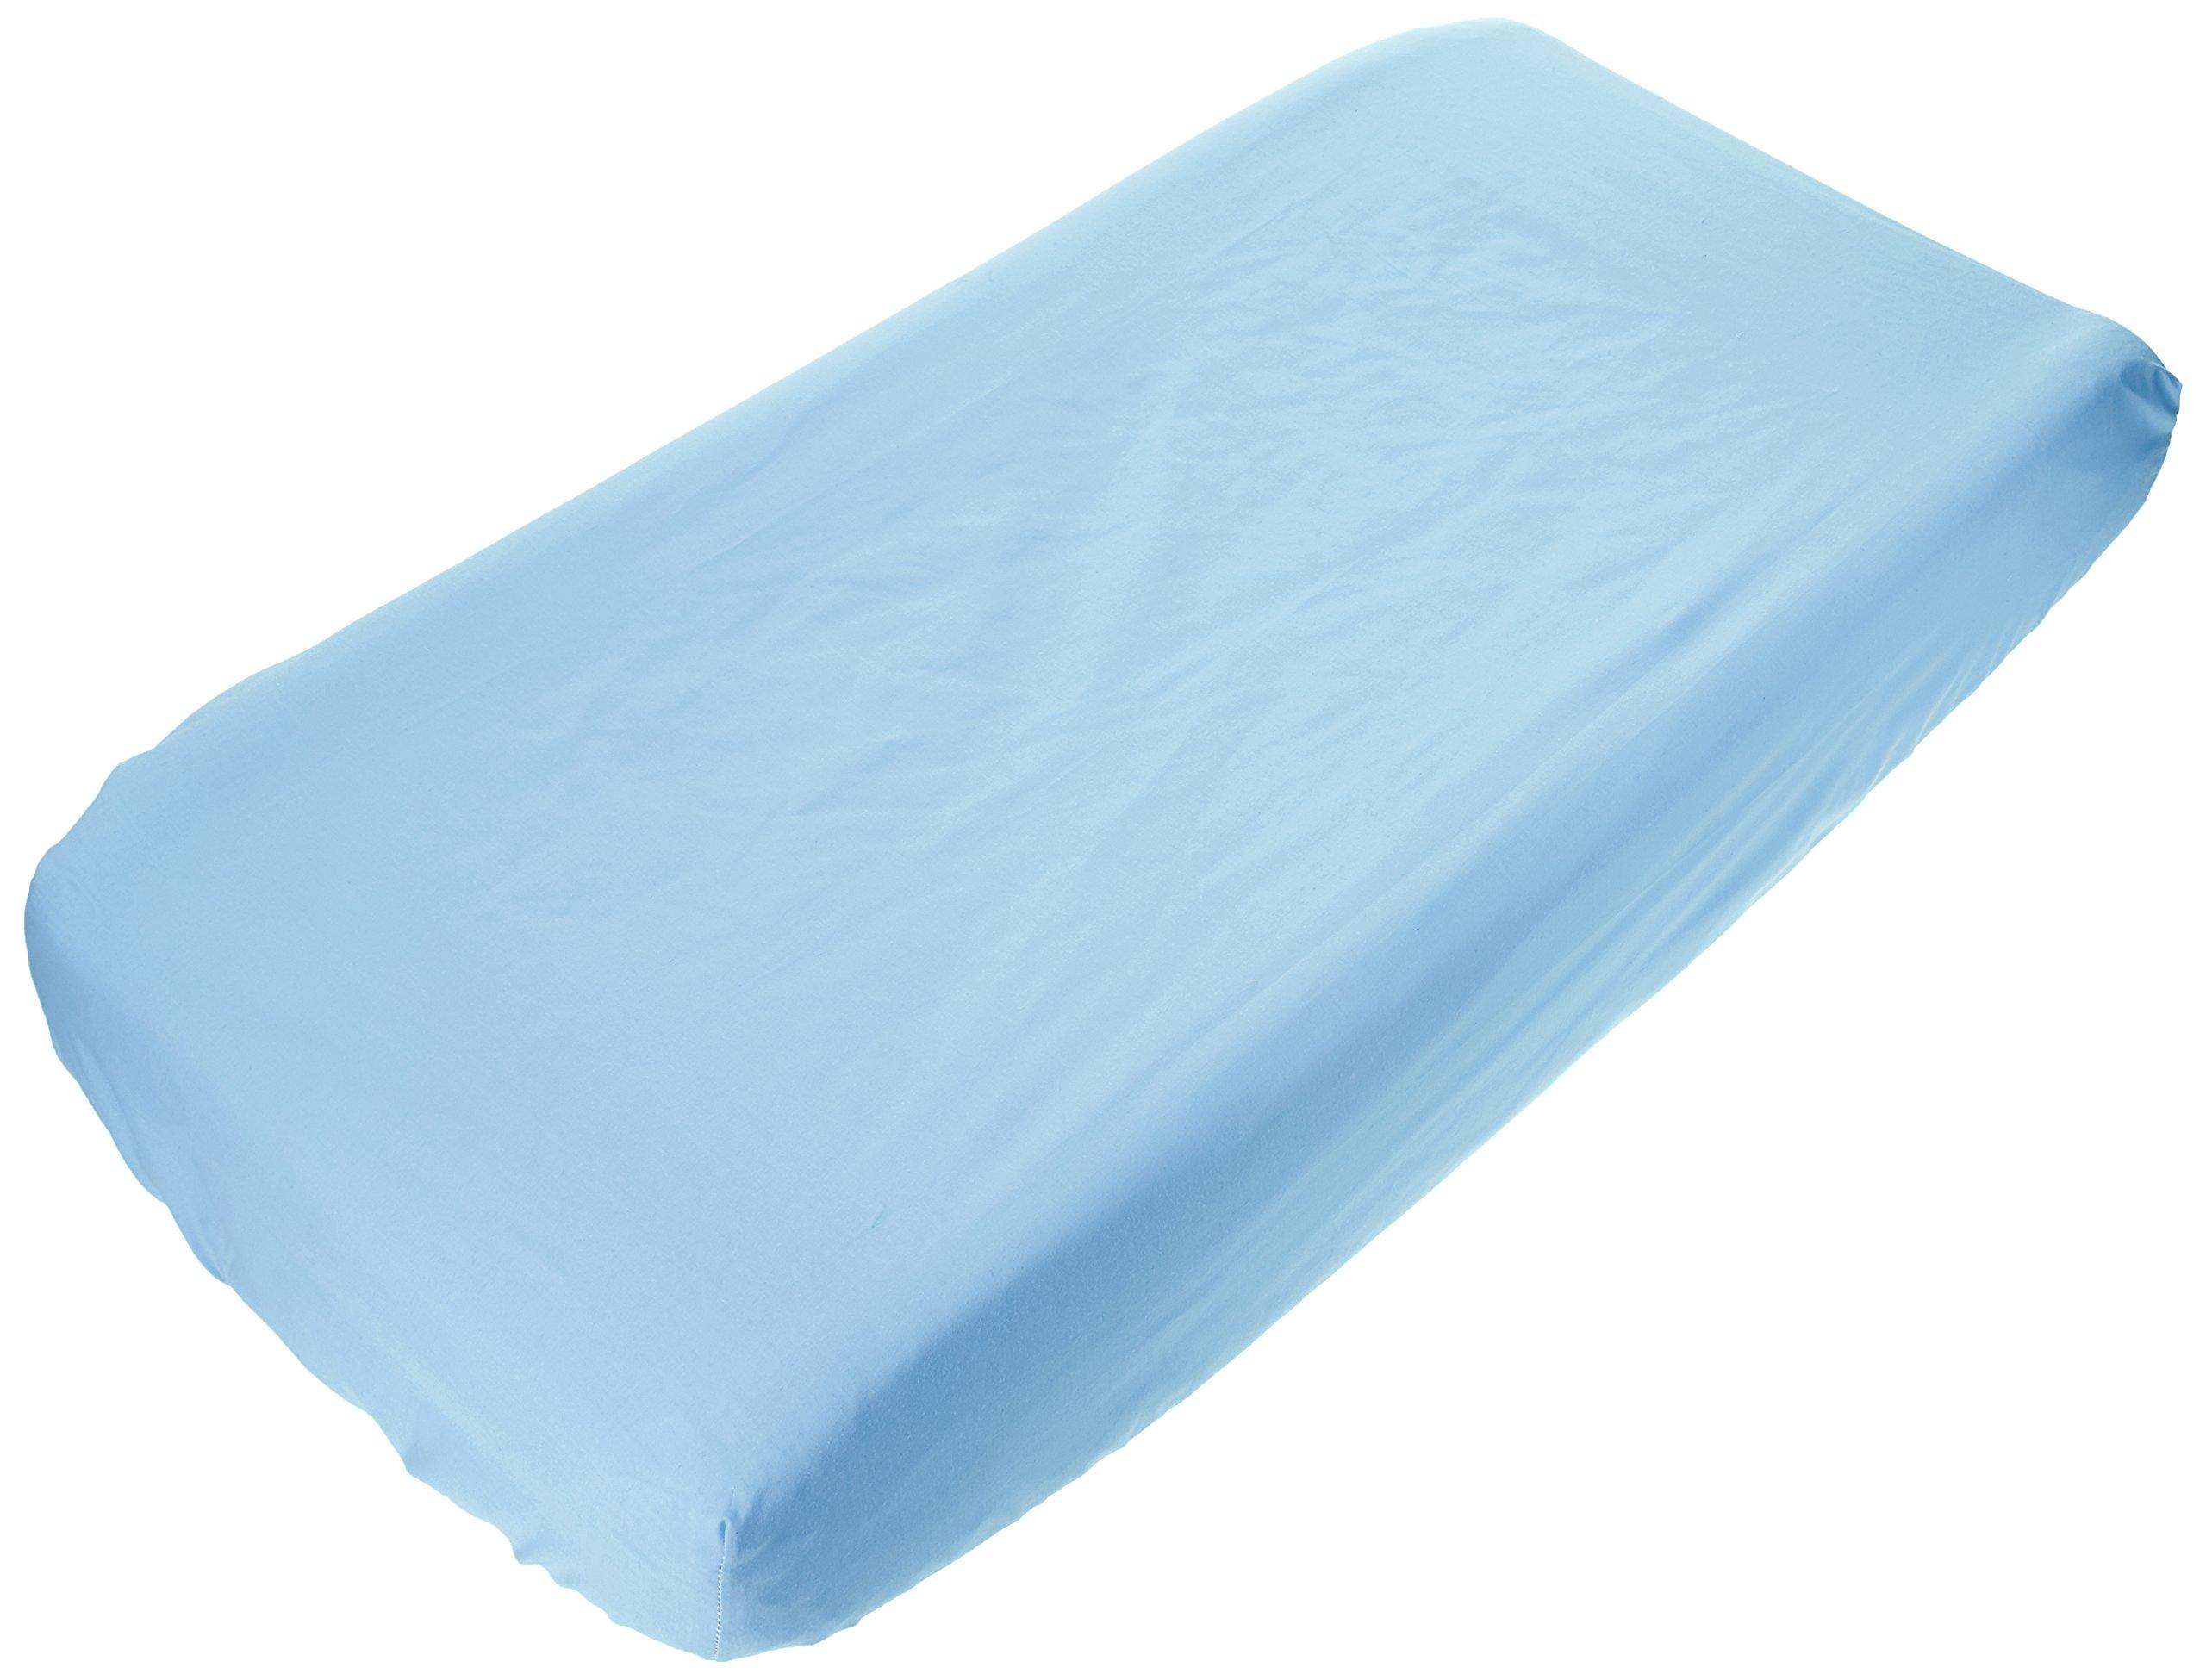 bkb Flat Changing Pad Cover, Light Blue